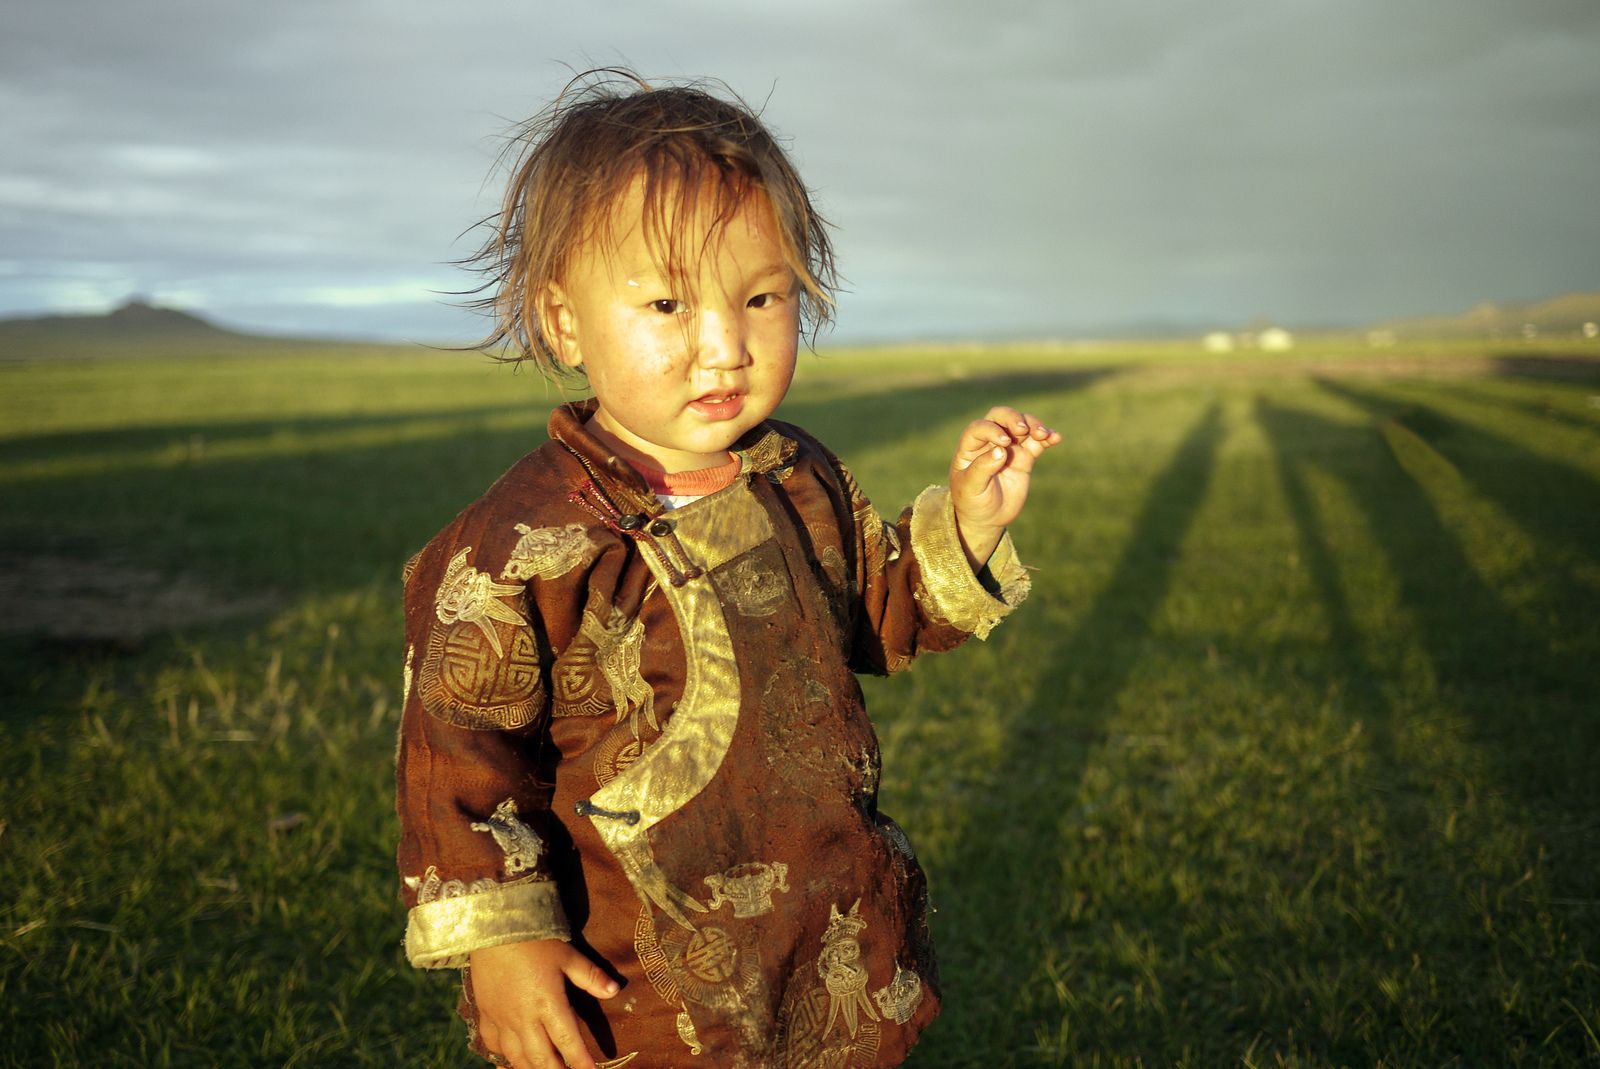 Little boy   Flickr - Photo Sharing!